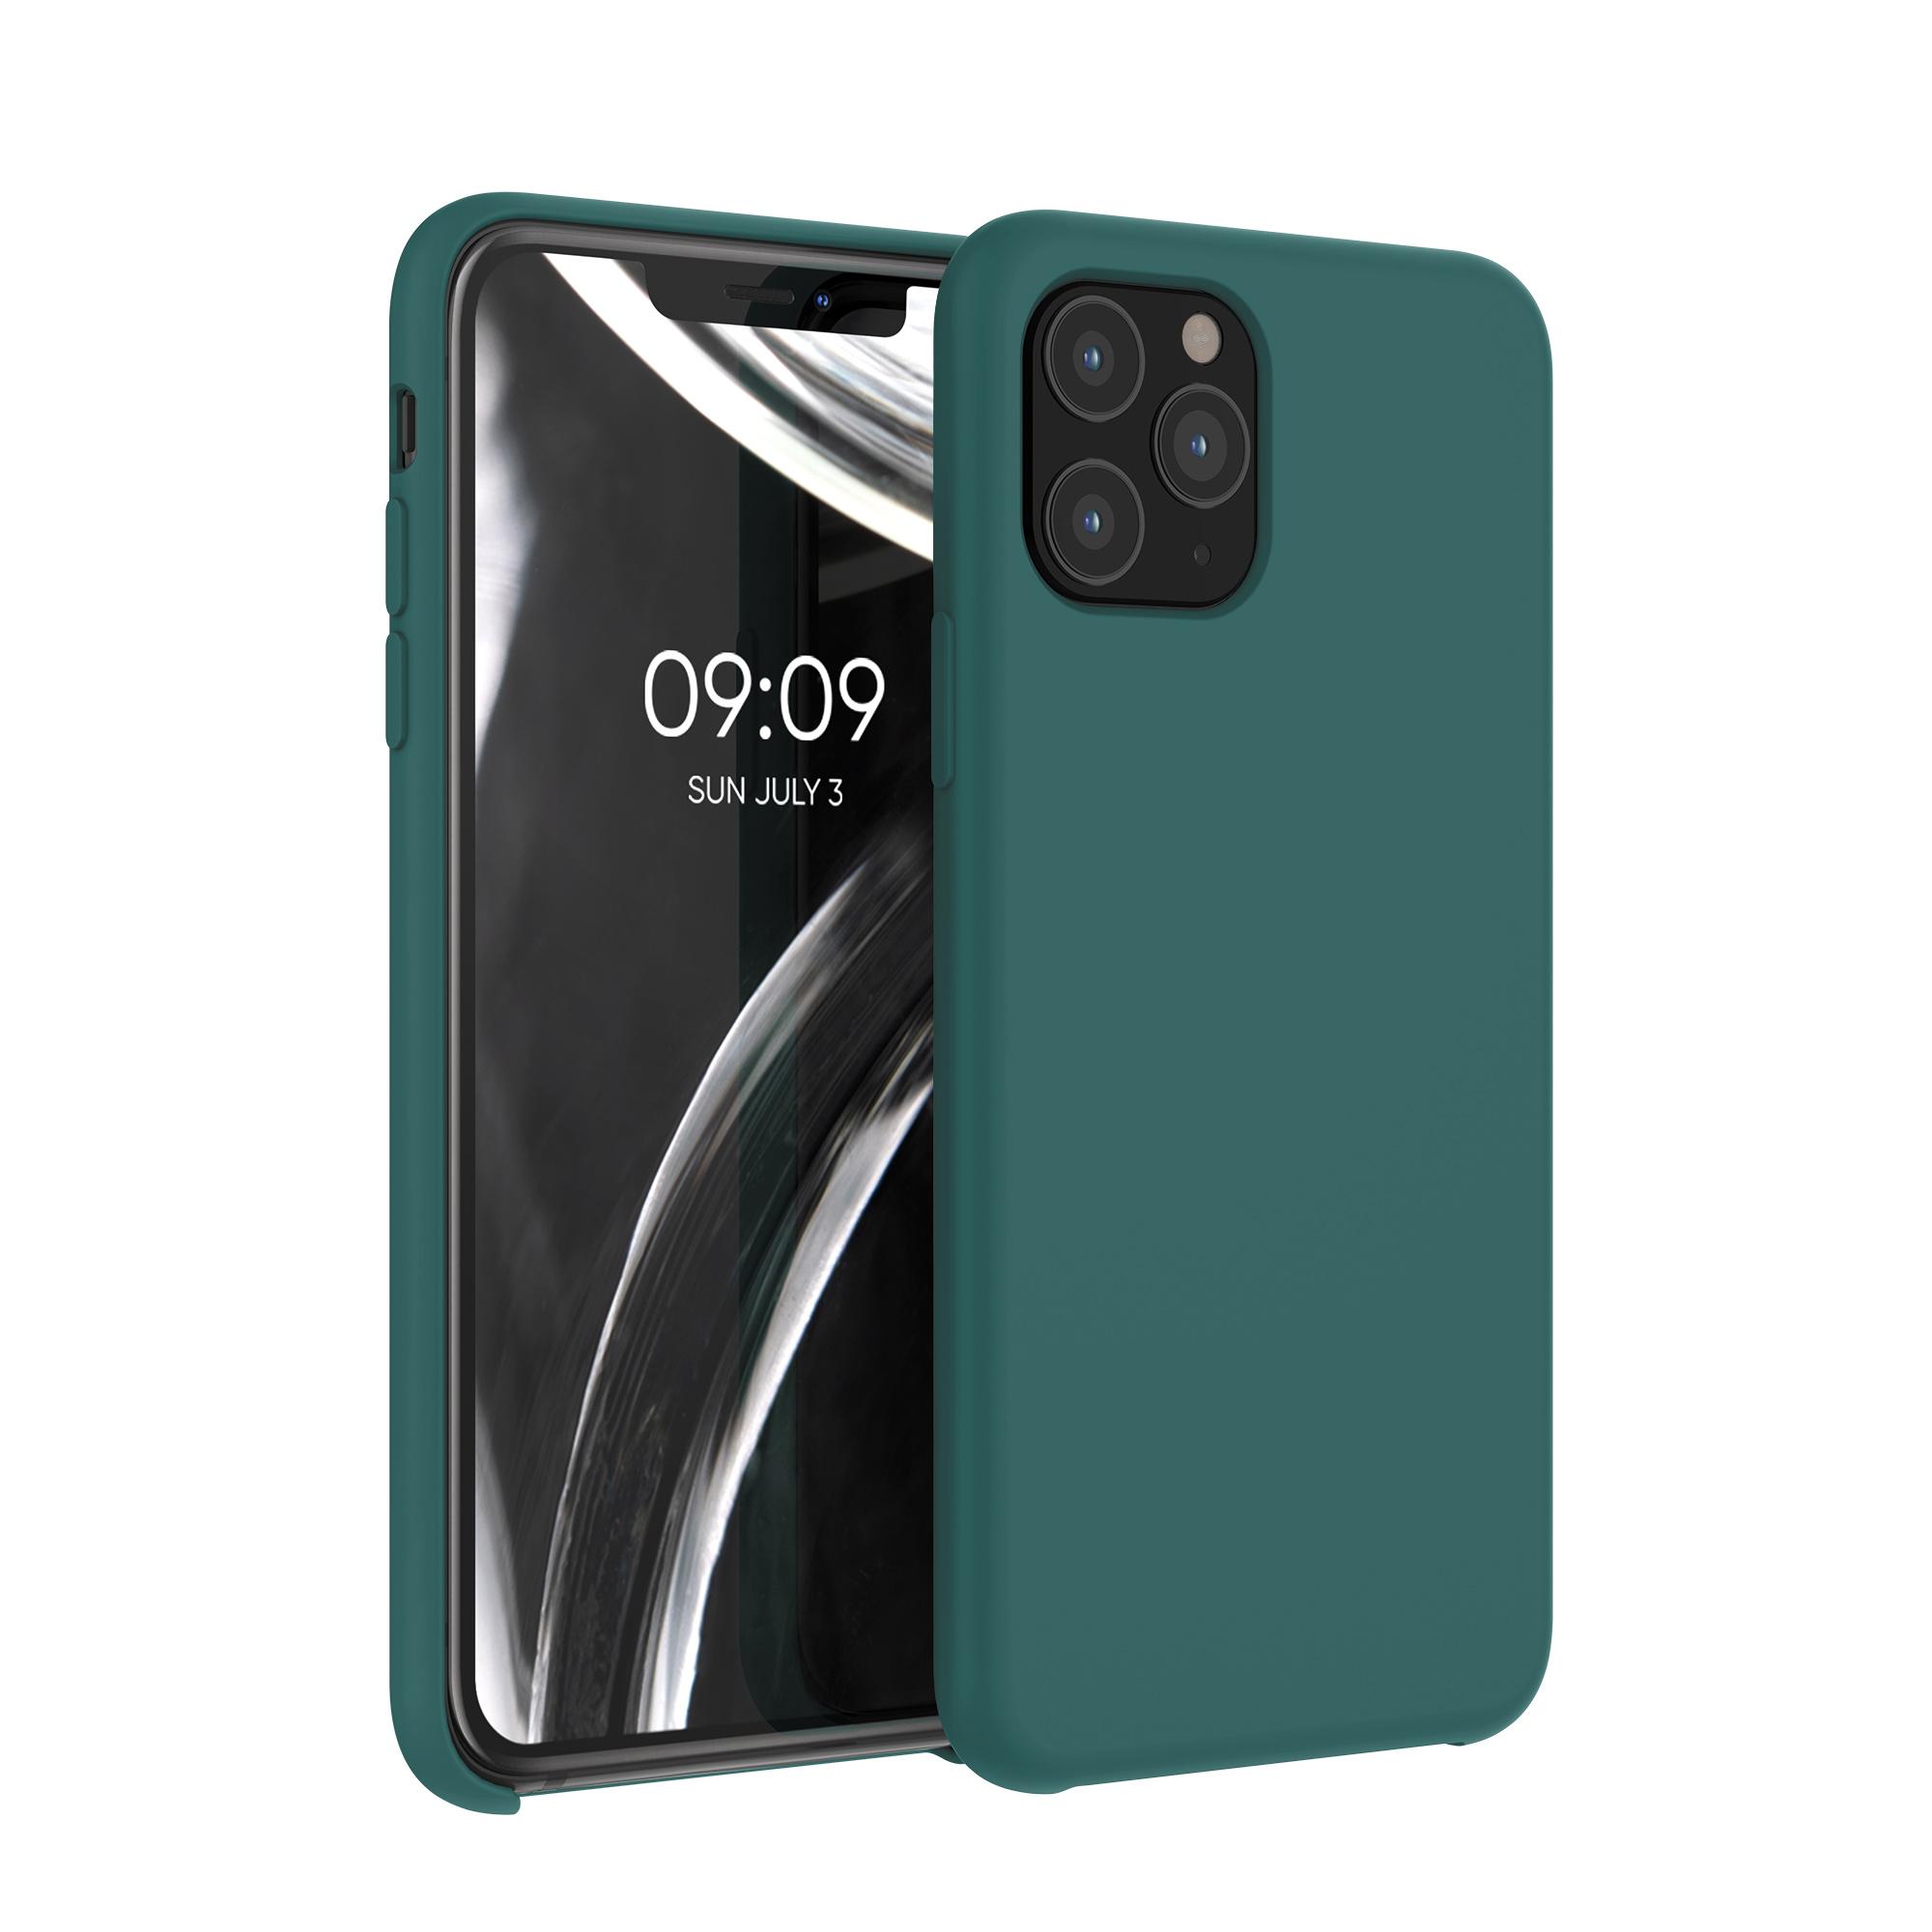 Kvalitní silikonové TPU pouzdro pro Apple iPhone 11 Pro - Turquoise Green